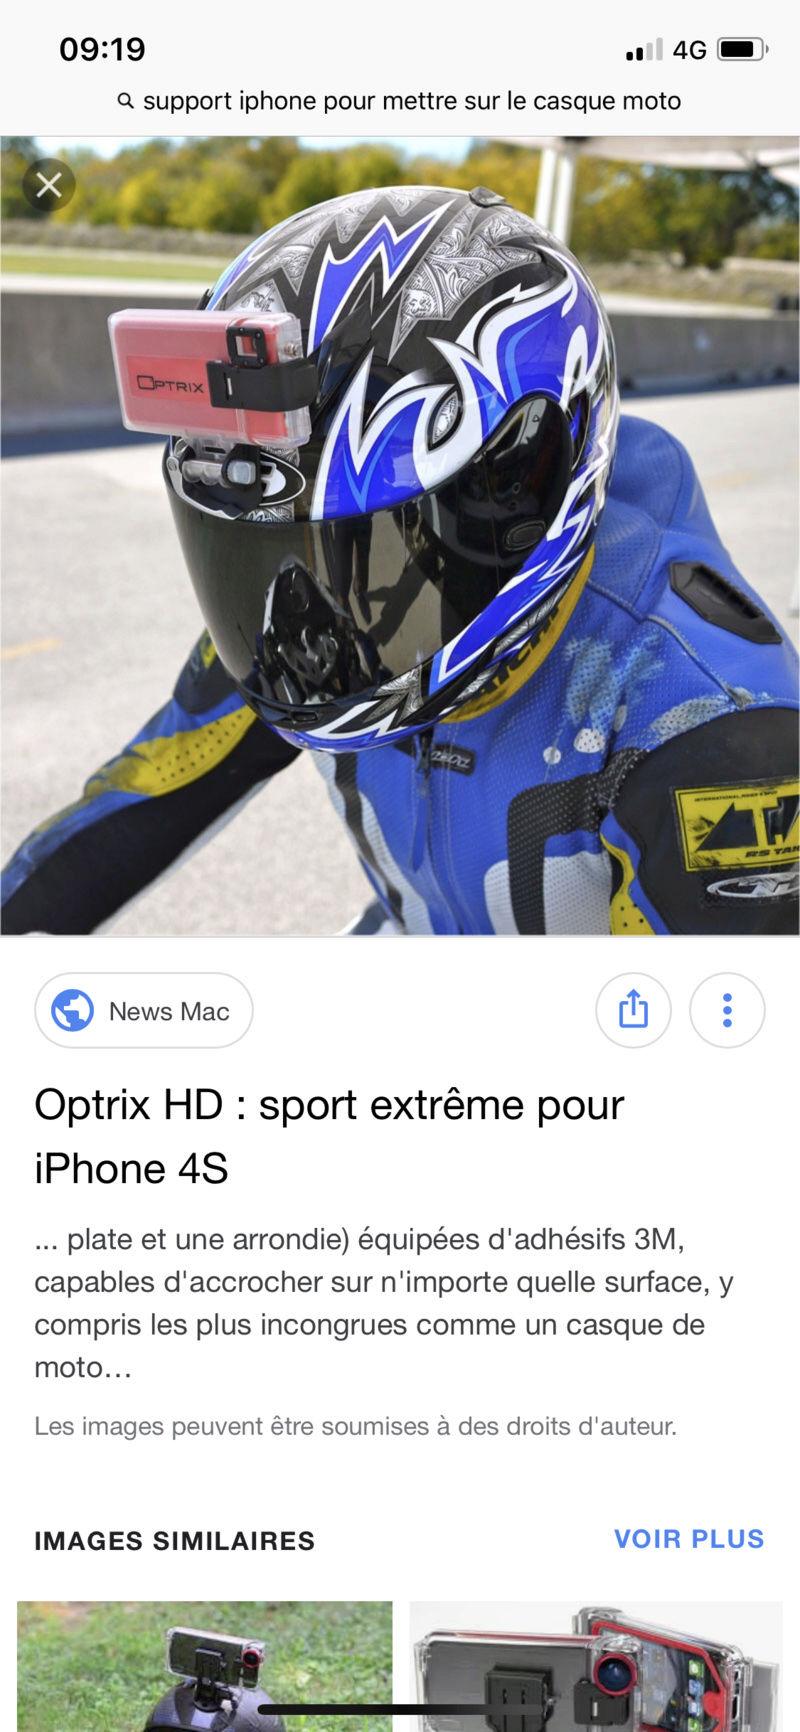 Attache iphone X casque moto F6495610